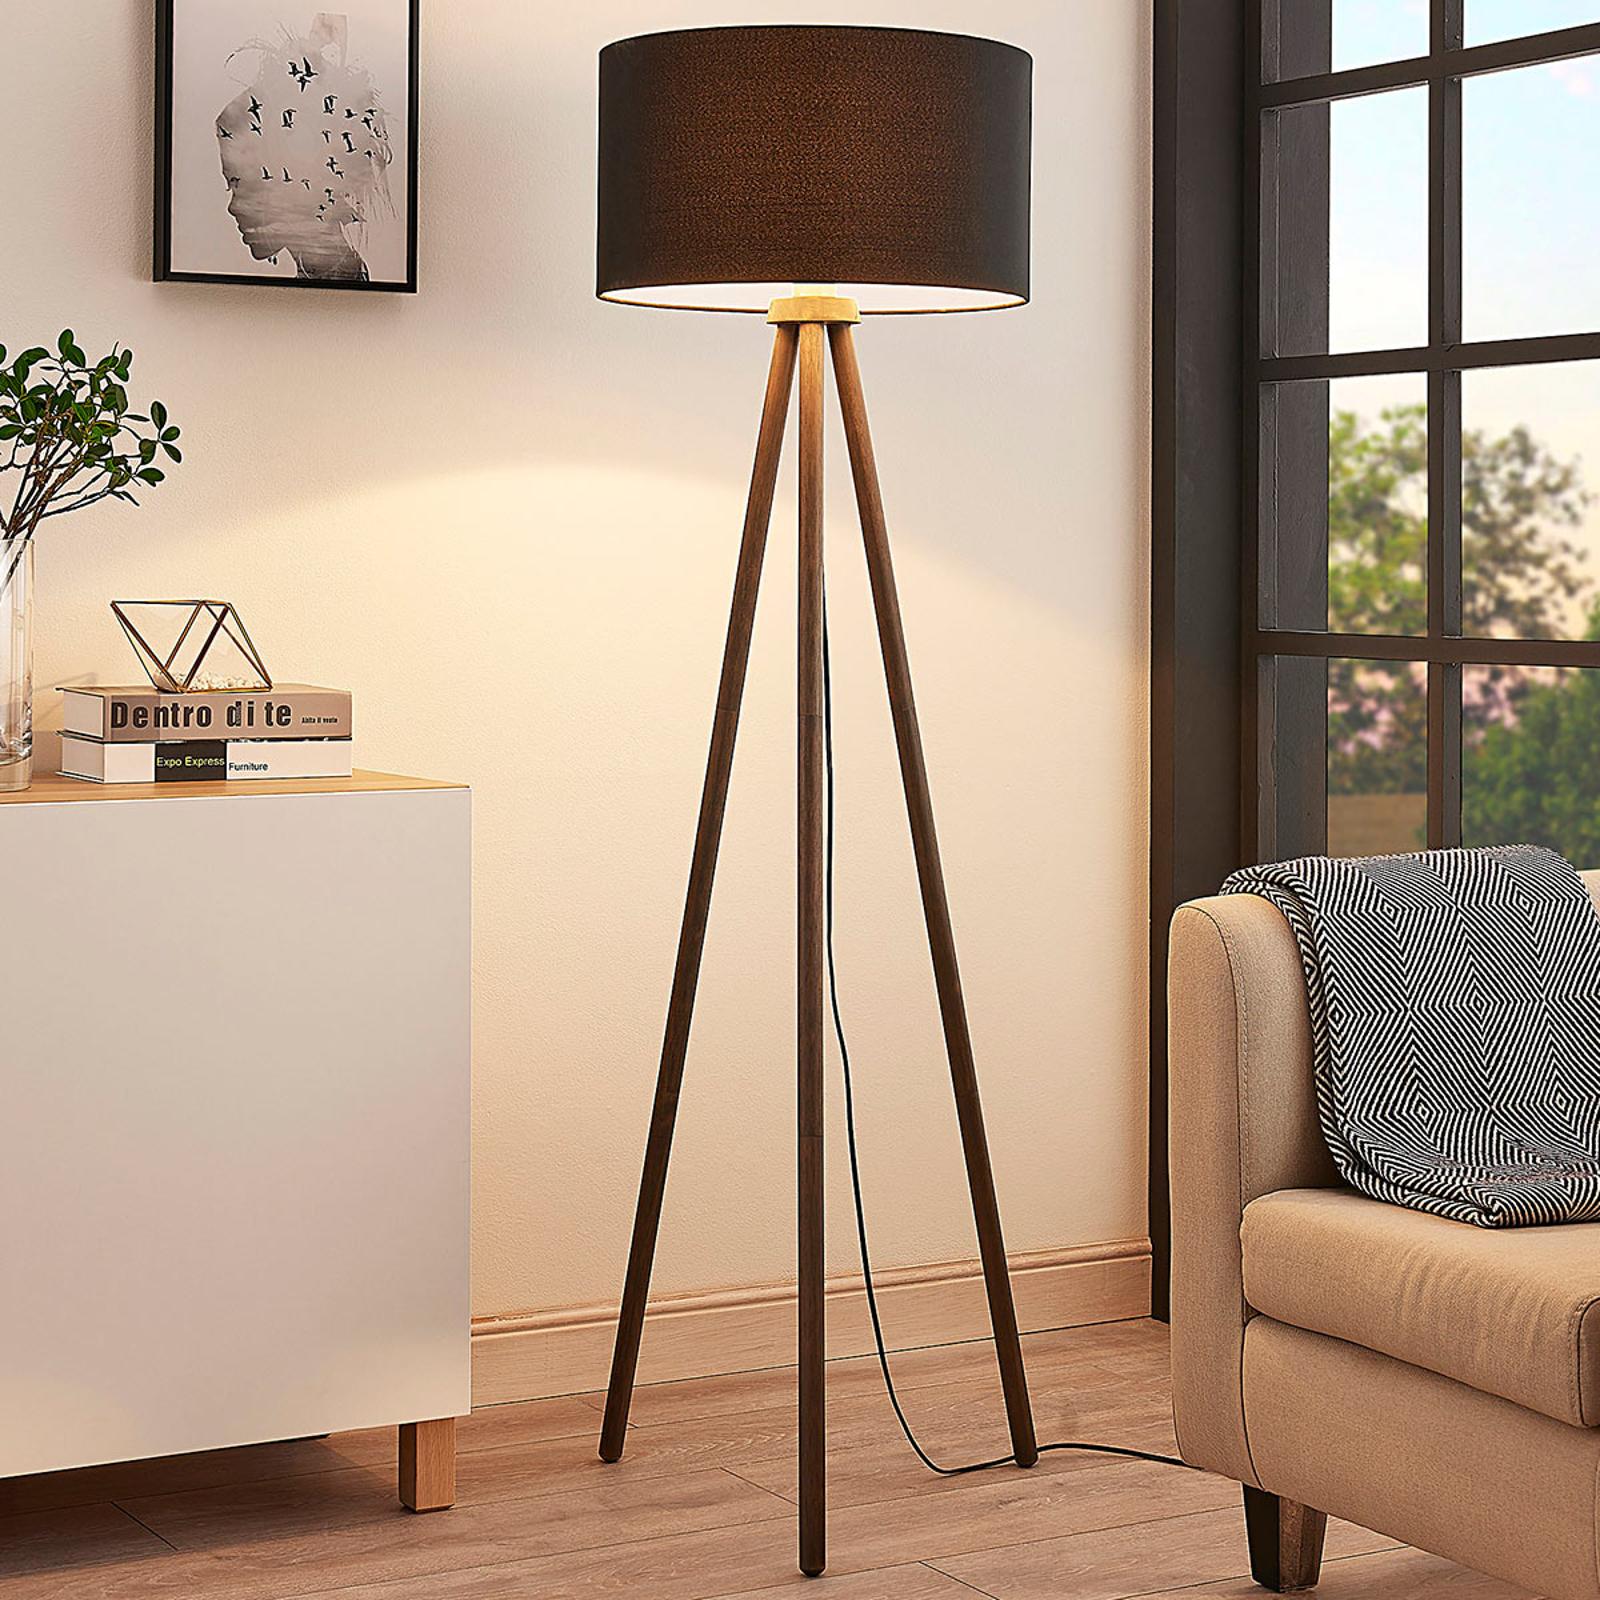 Tekstylna lampa stojąca Majken – ciemnoszara/czerń